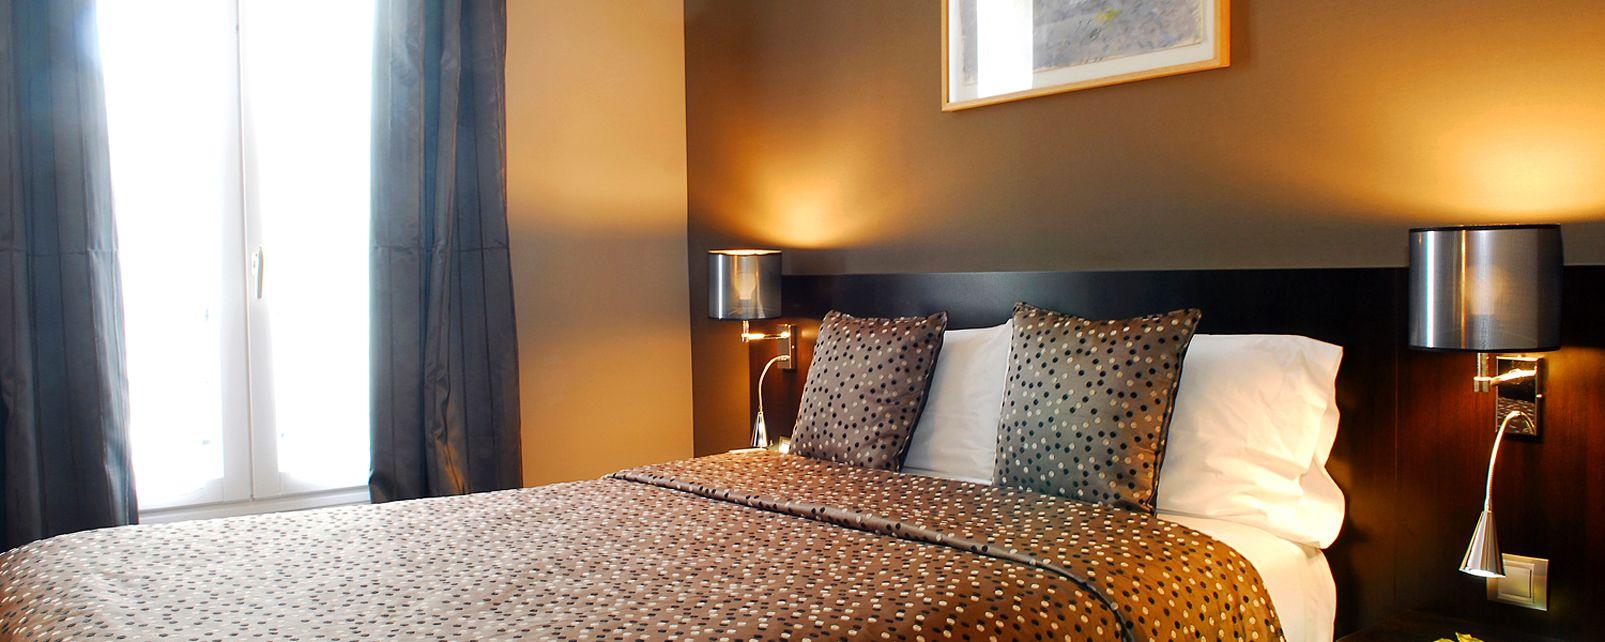 Hotel Exclusive Jardin De Villiers Paris